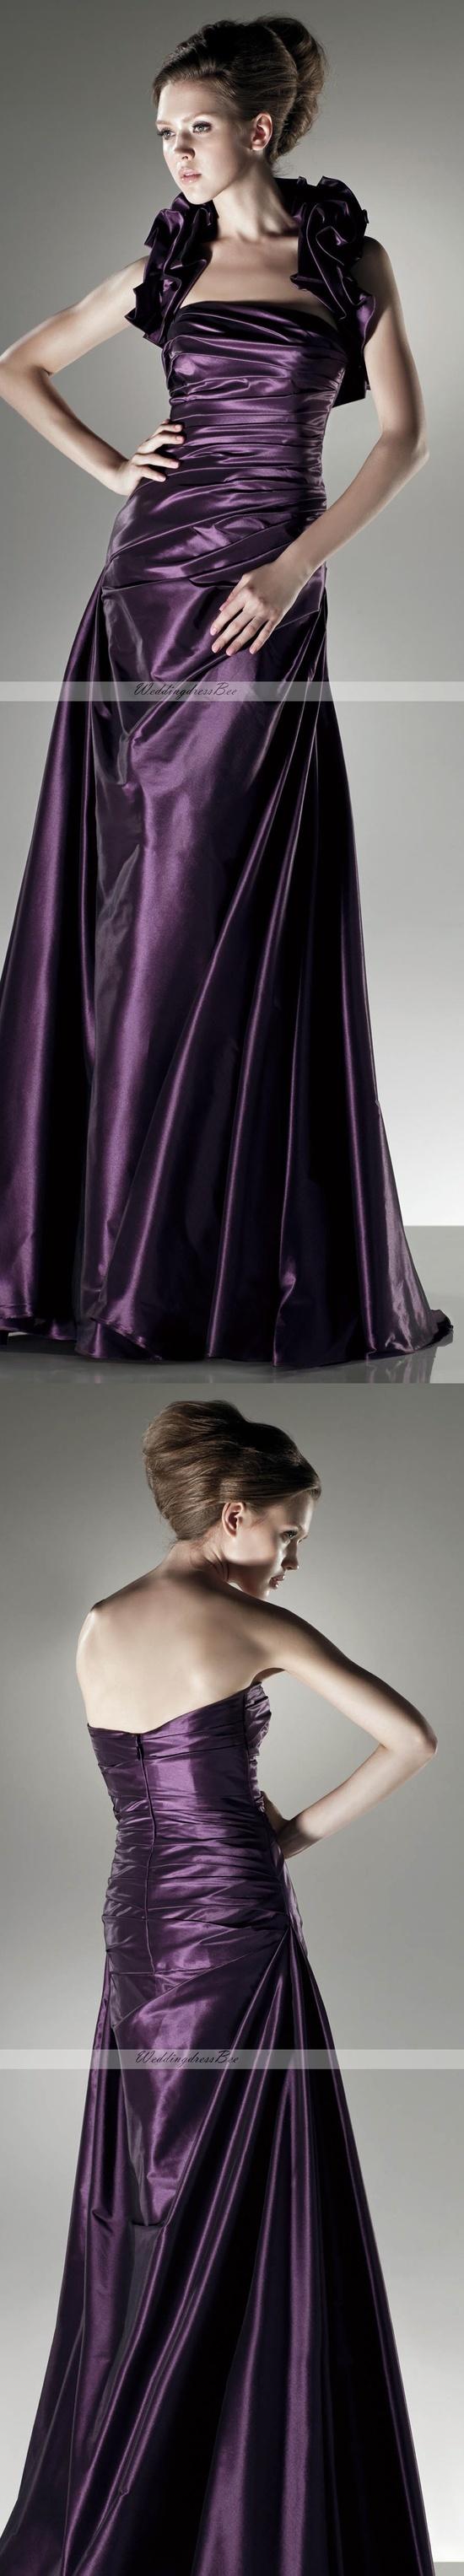 Deep Purple Wedding Dresses : Deep purple wedding dresses gowns cheap